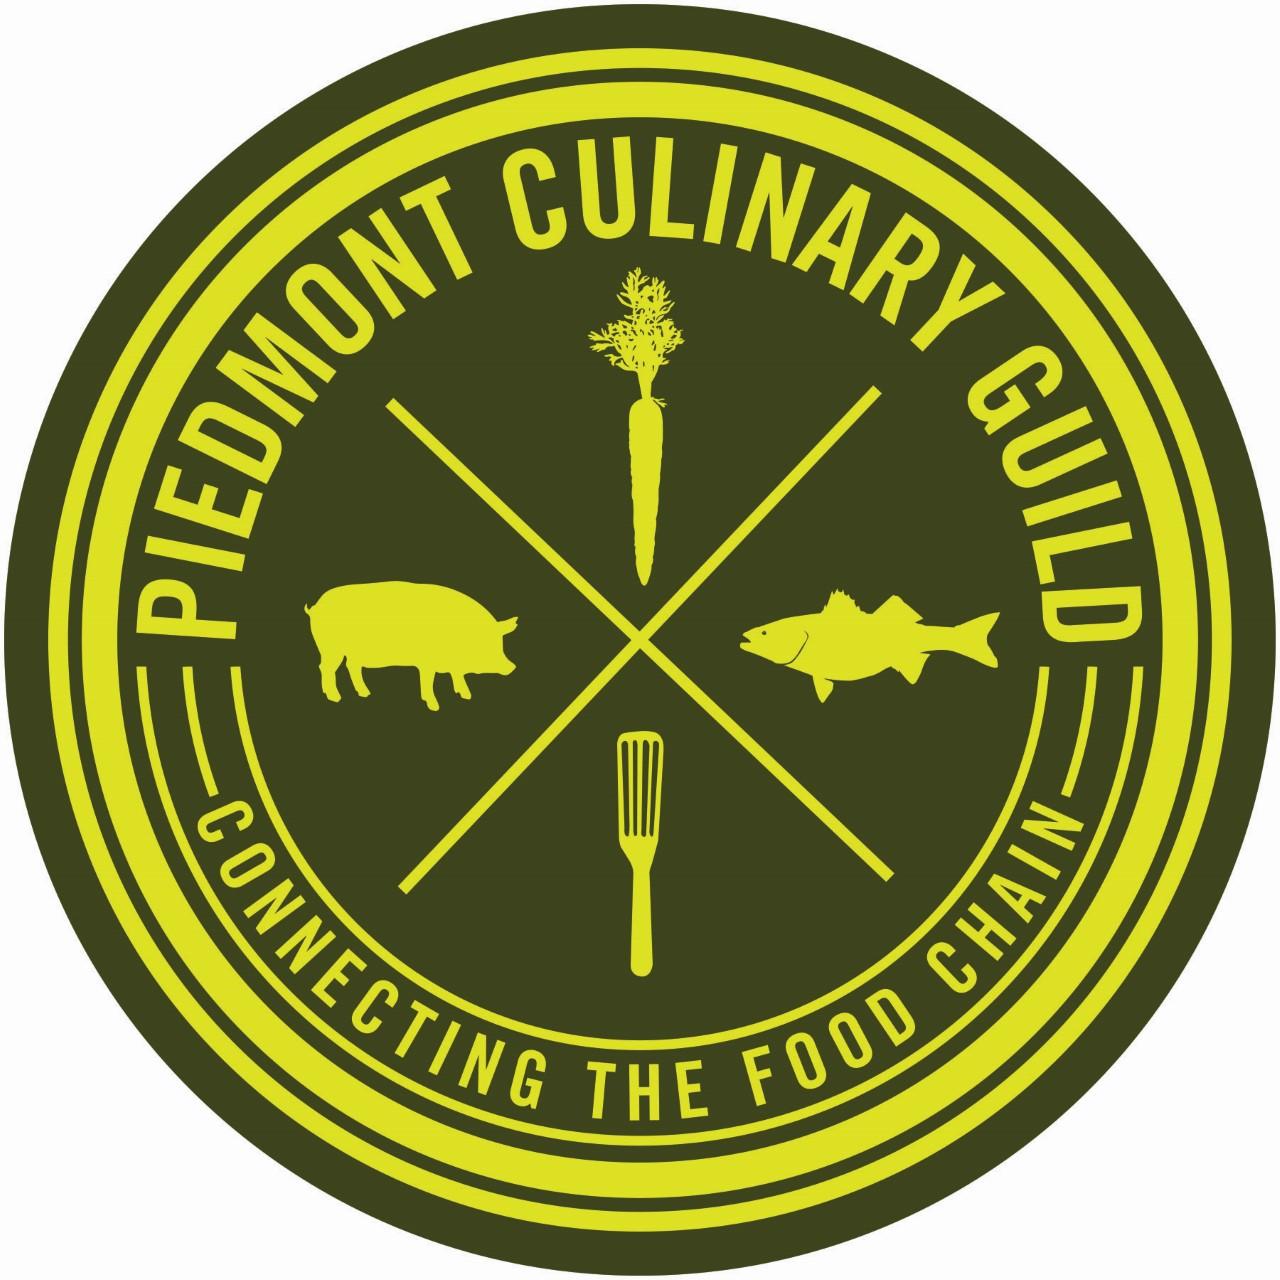 Piedmont Culinary Guild Dinner